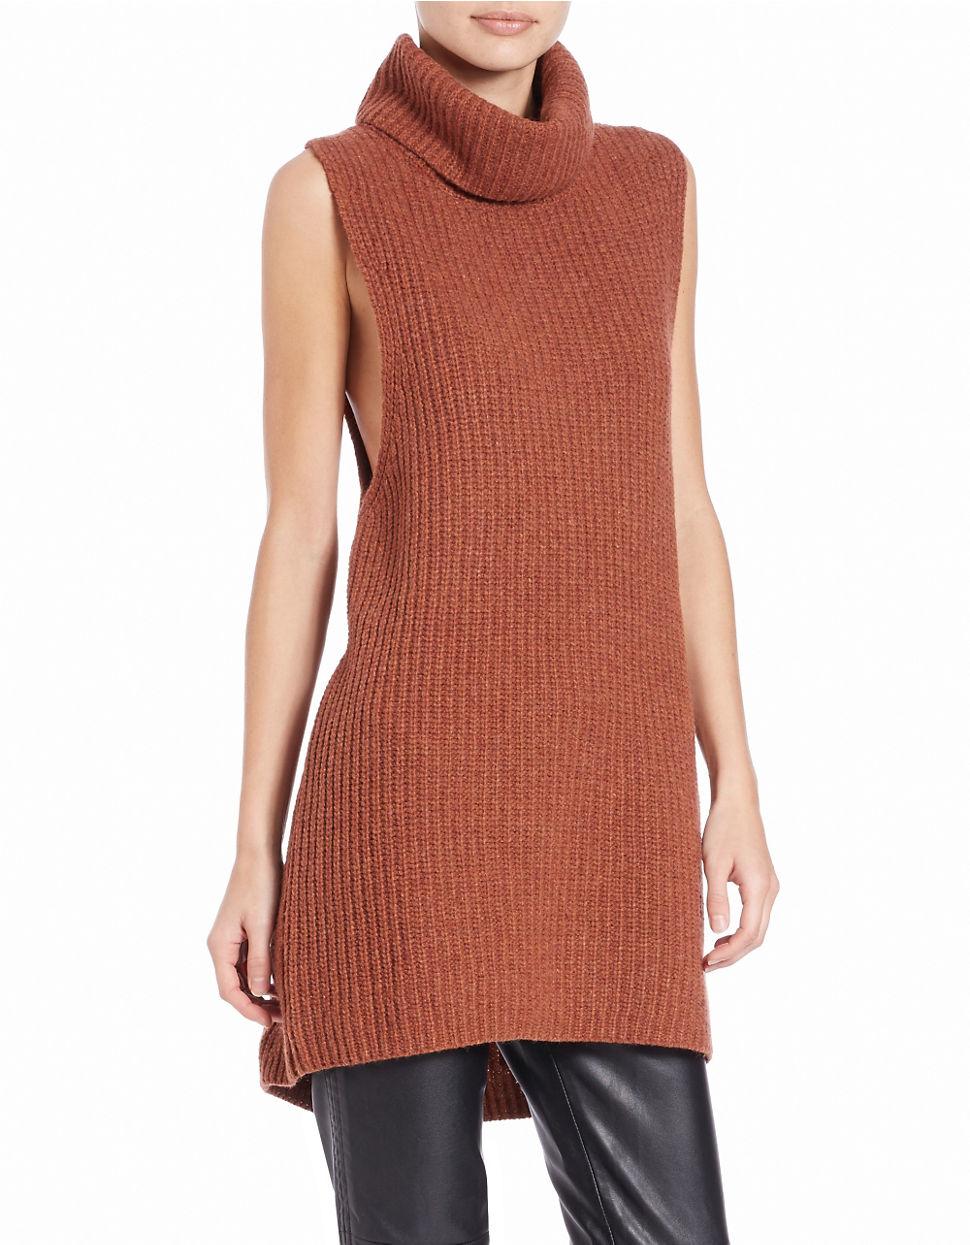 Free people Split-back Sleeveless Sweater in Brown | Lyst